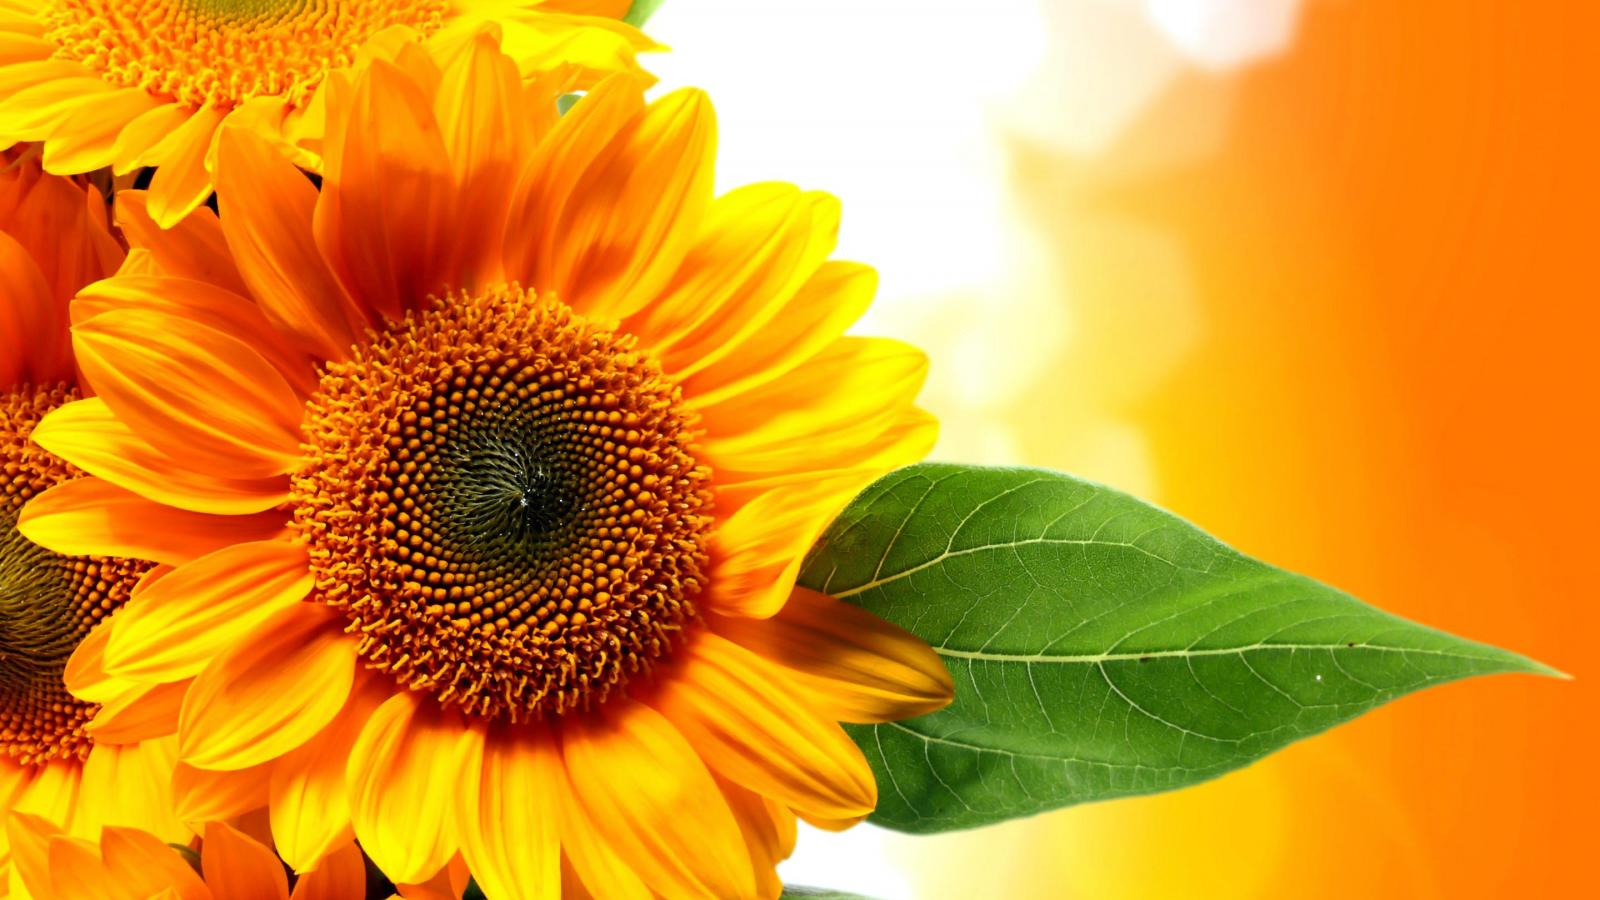 34+ Autumn Sunflower Desktop Wallpaper on WallpaperSafari